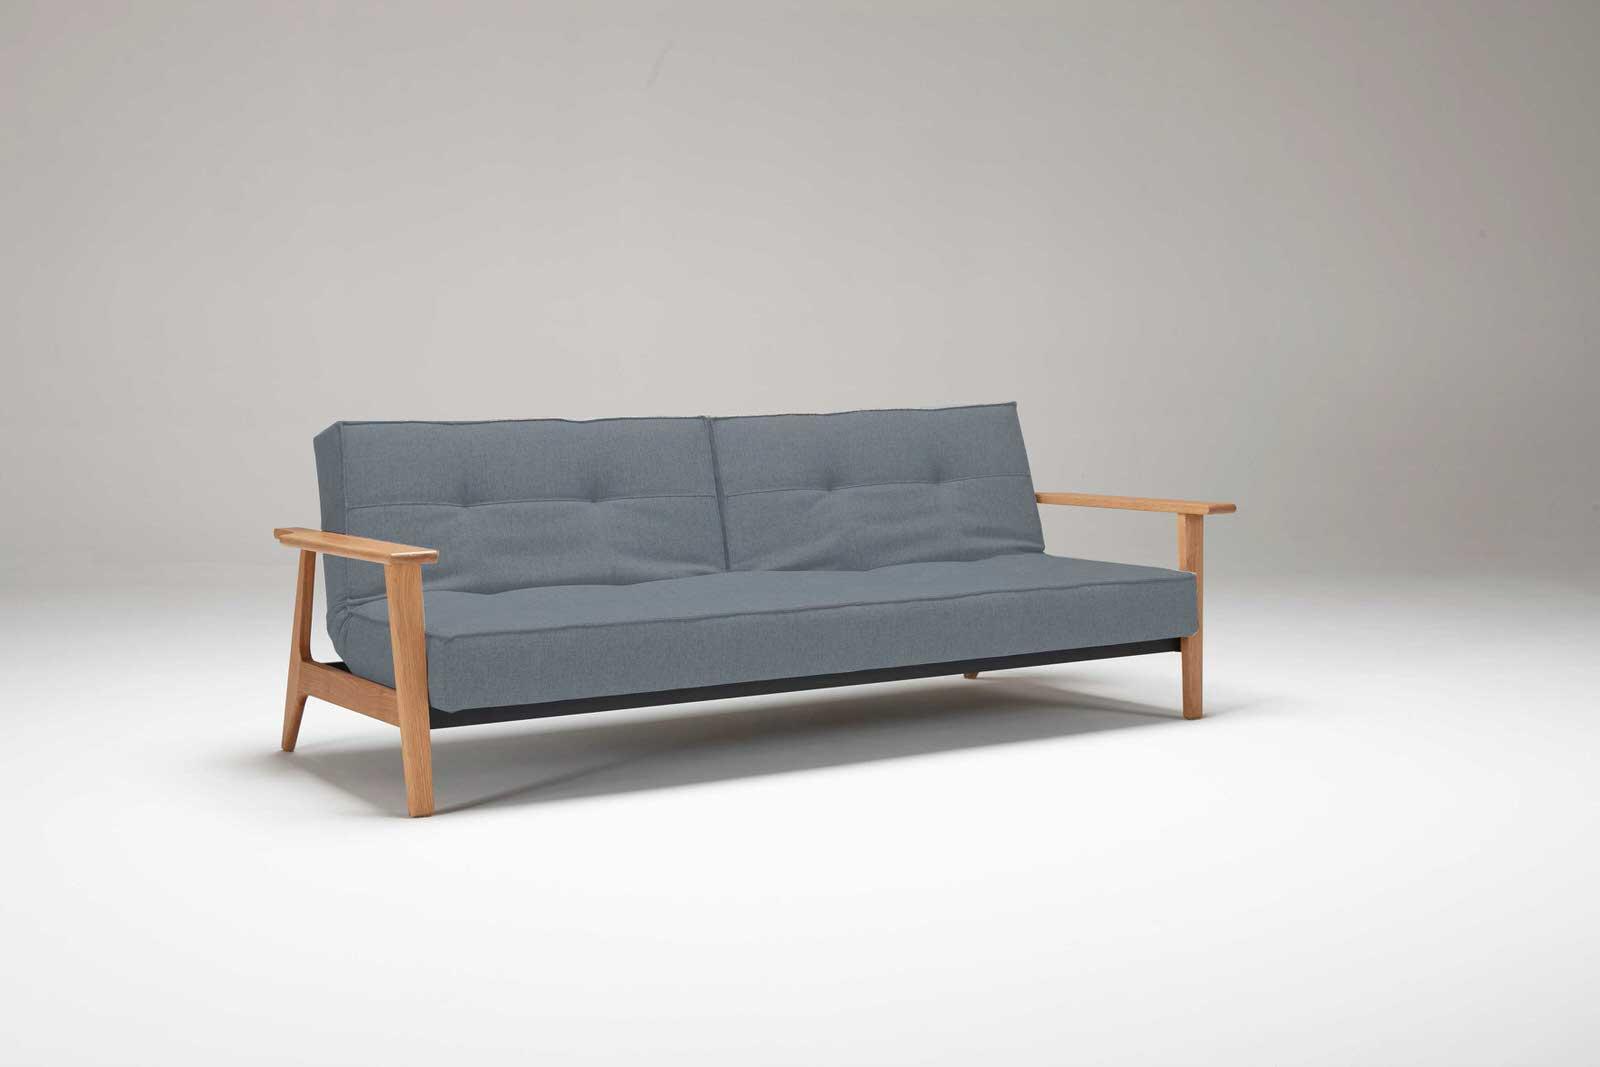 splitback sofa bed w frej arms mixed dance light blue by innovation. Black Bedroom Furniture Sets. Home Design Ideas